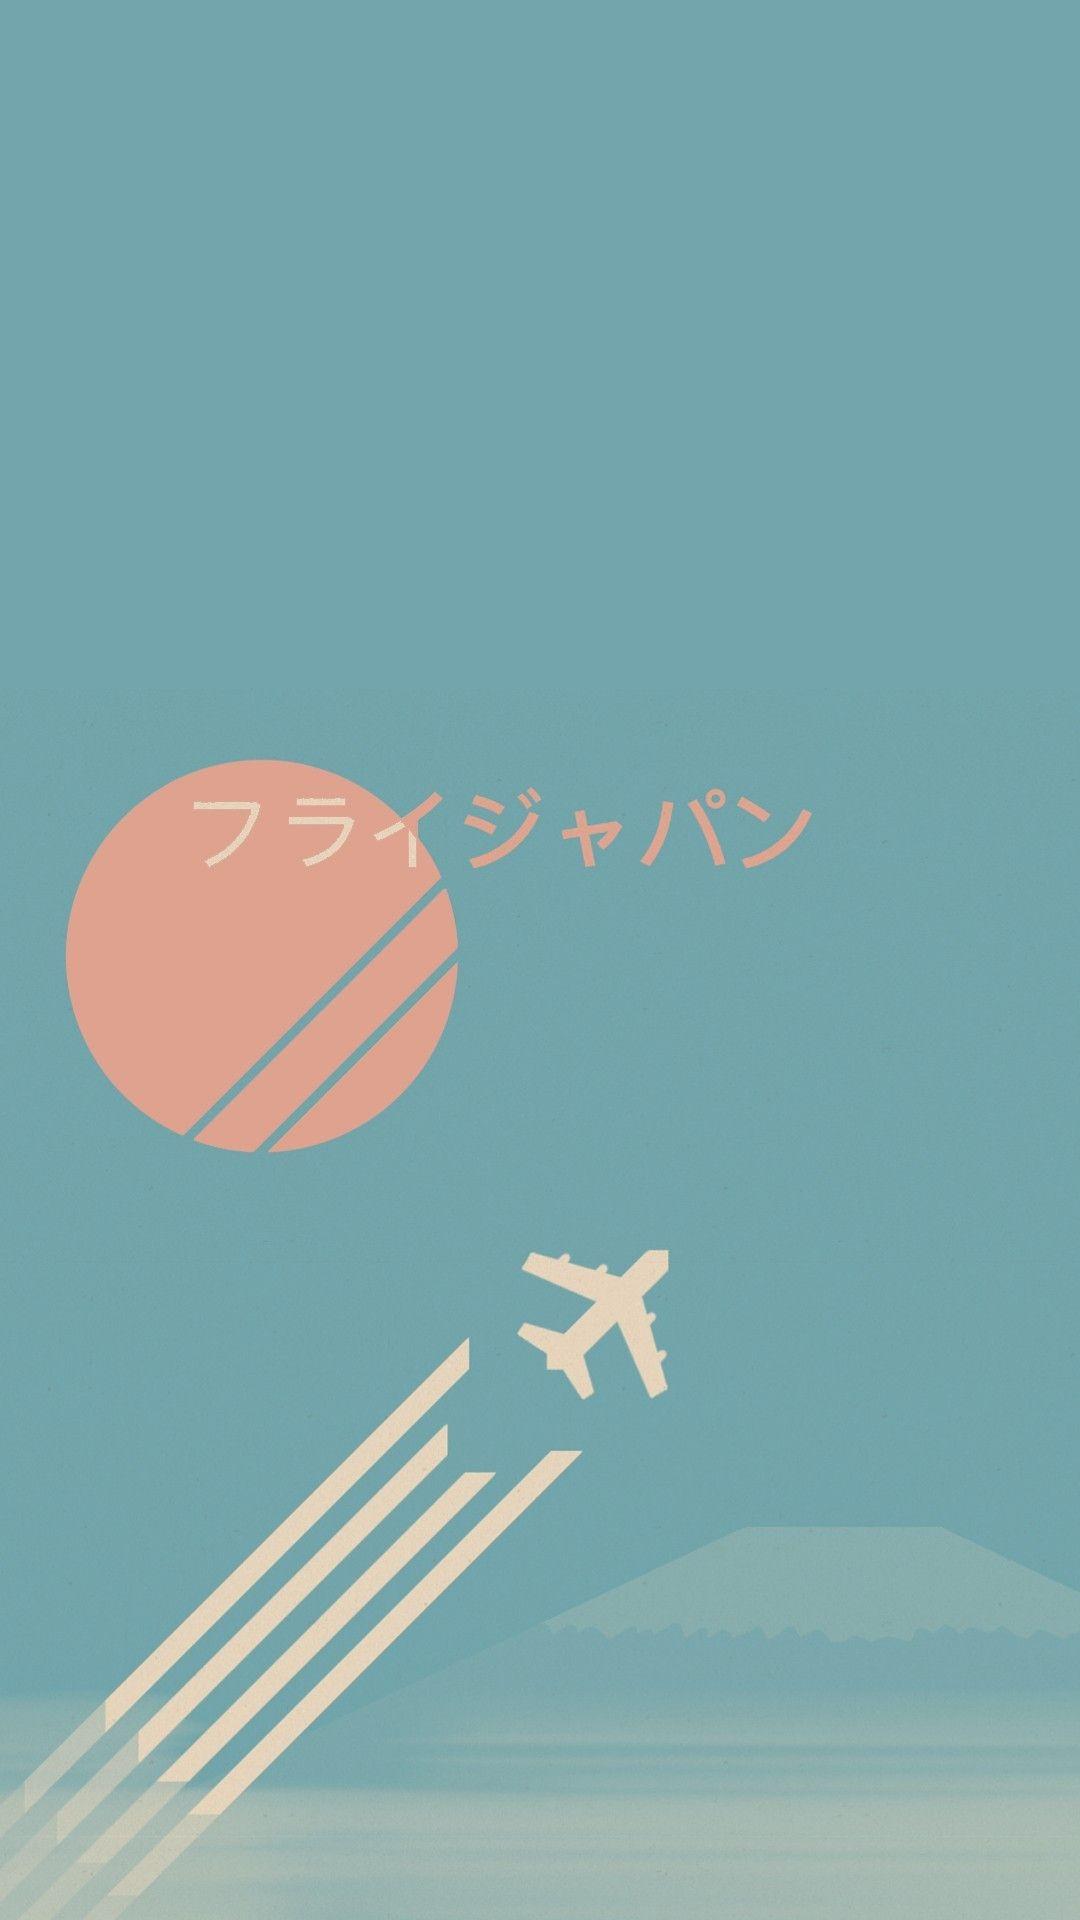 Pin By Lil Intro Vert On aesthetic Japanese Background Asian Wallpaper Vaporwave Wallpaper